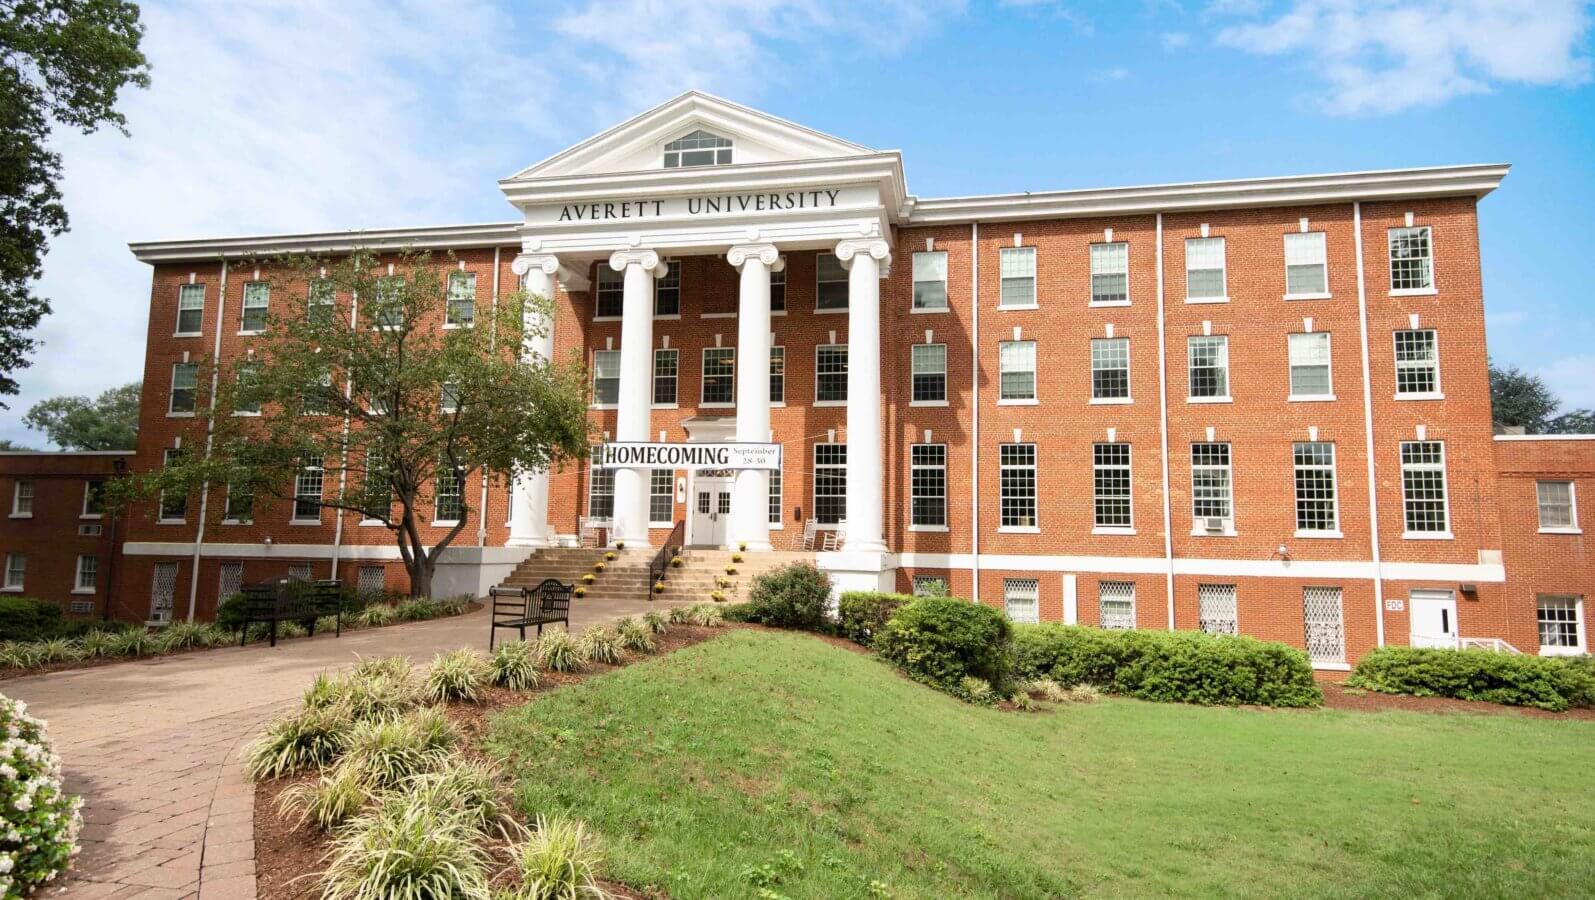 Averett University Main Hall